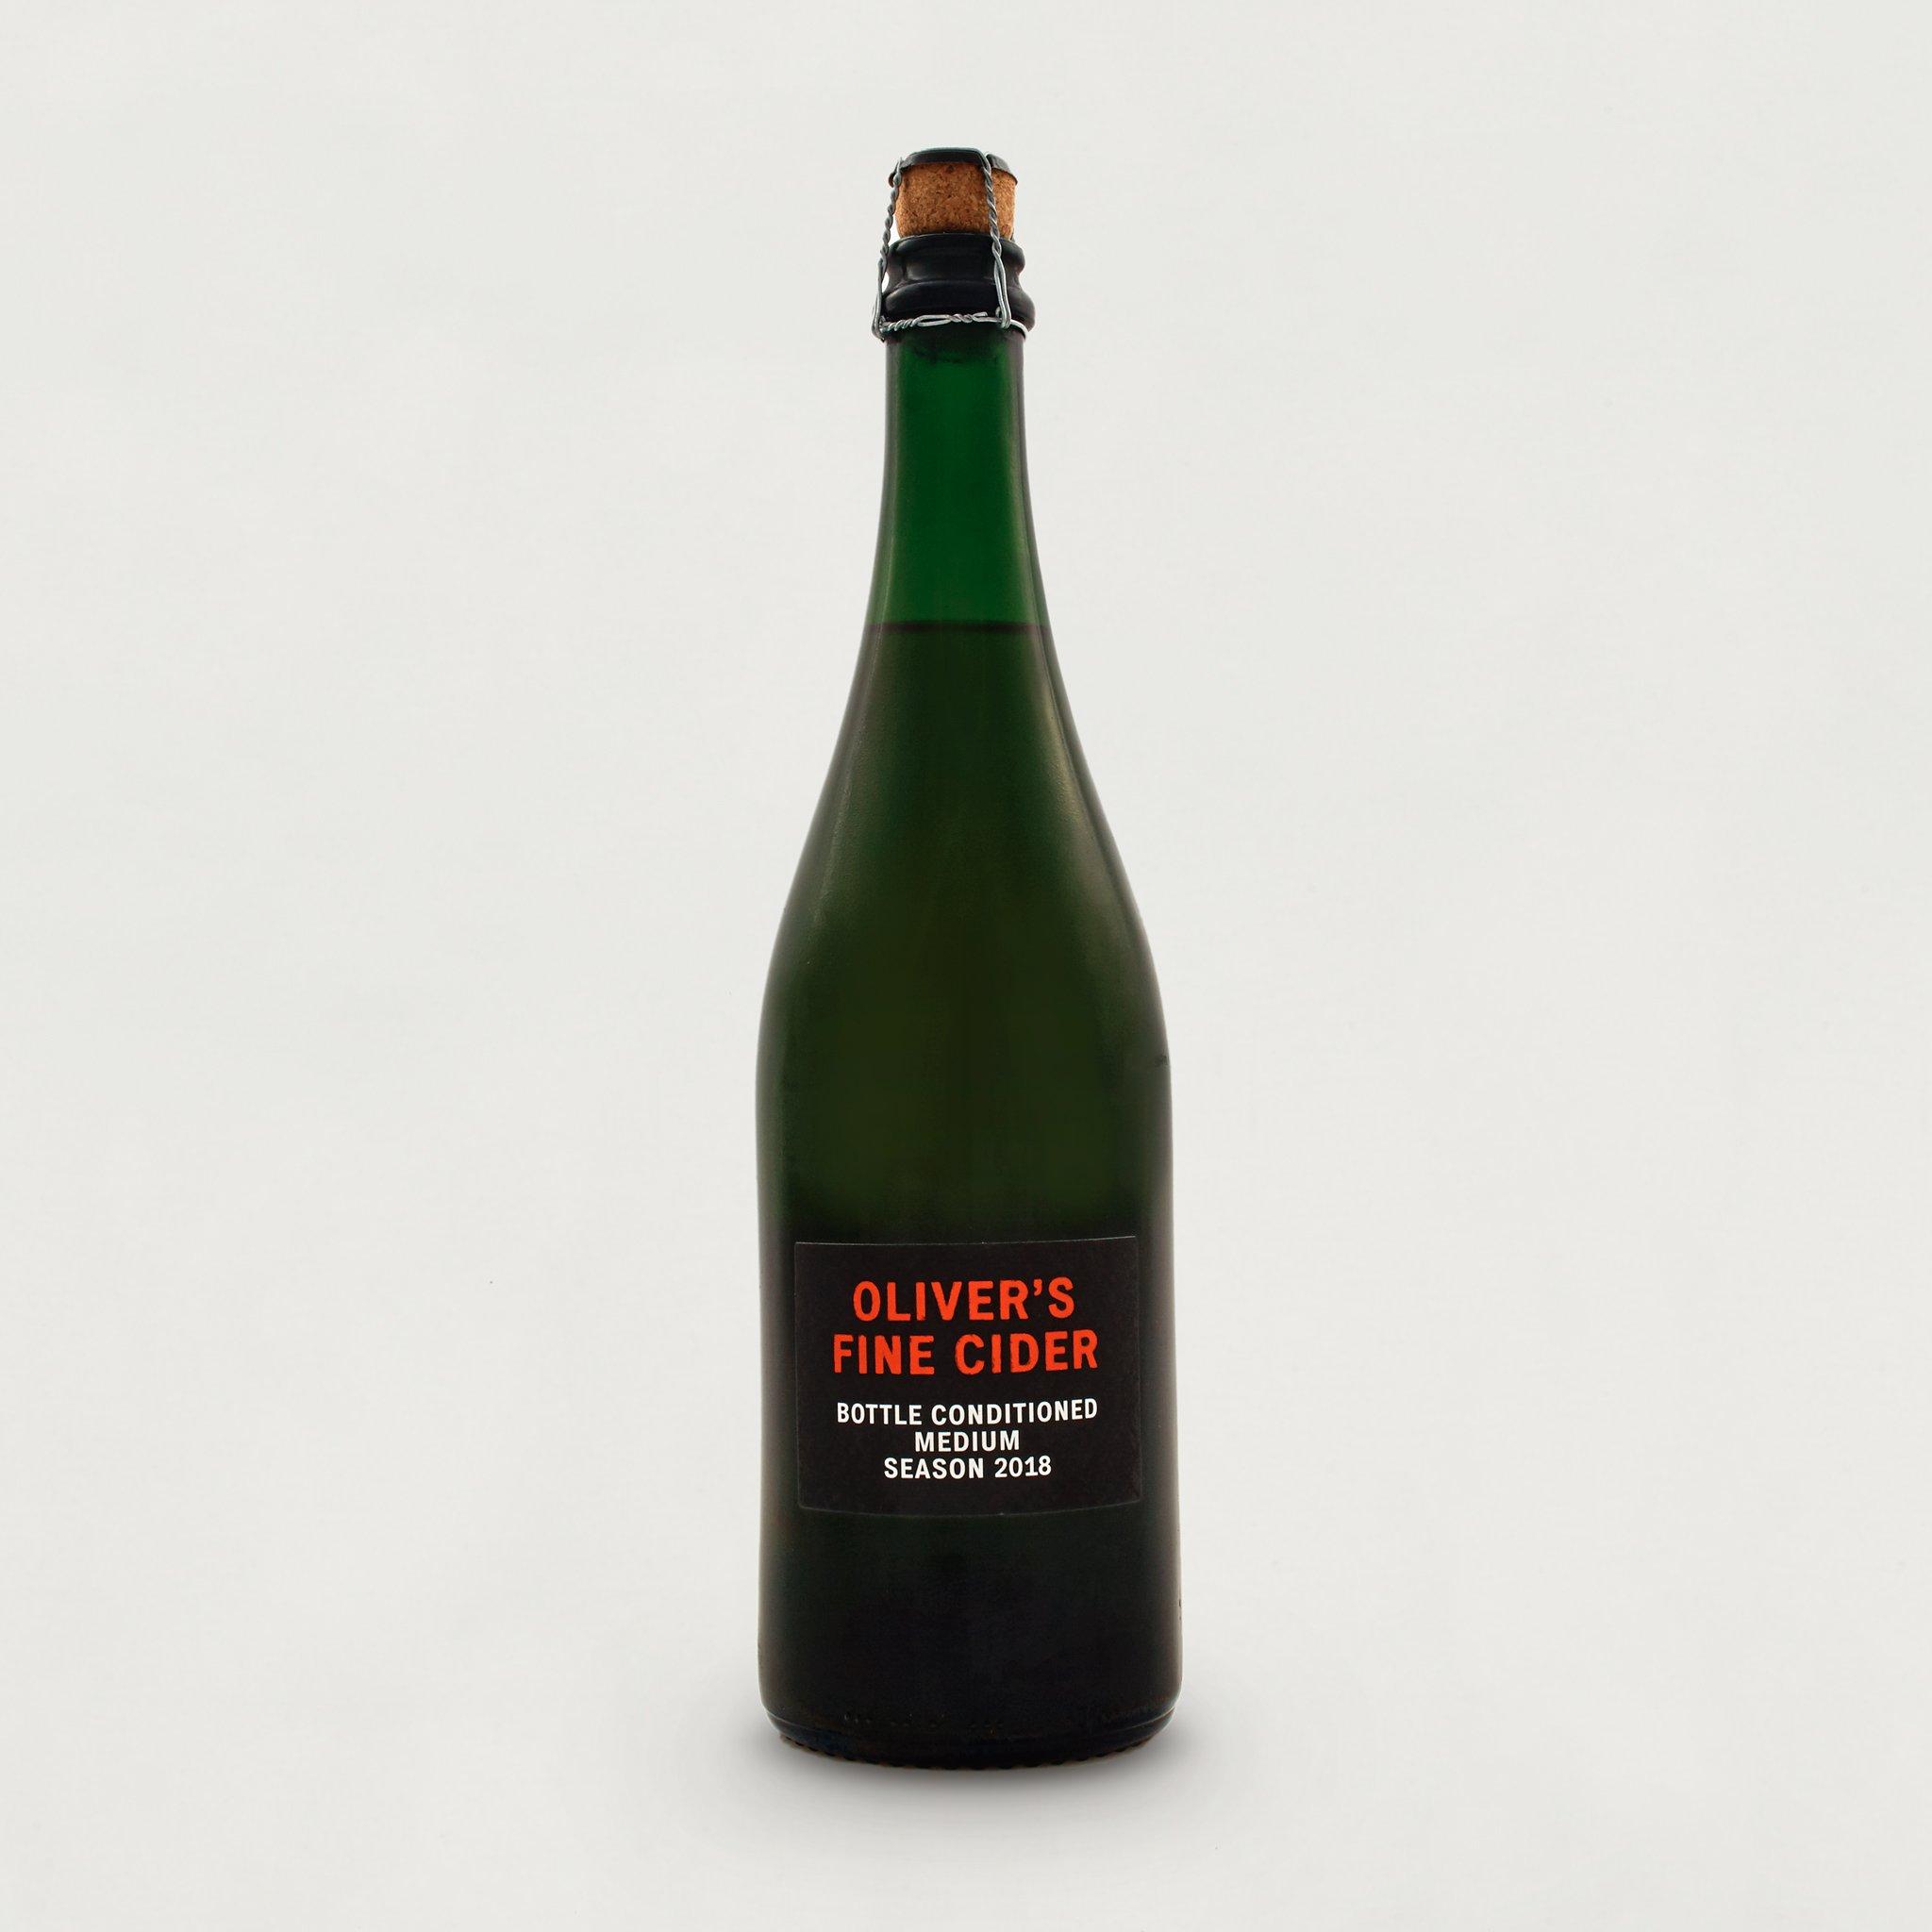 Oliver's Fine Cider Bottle Conditioned Medium 2018 5.4% (750ml)